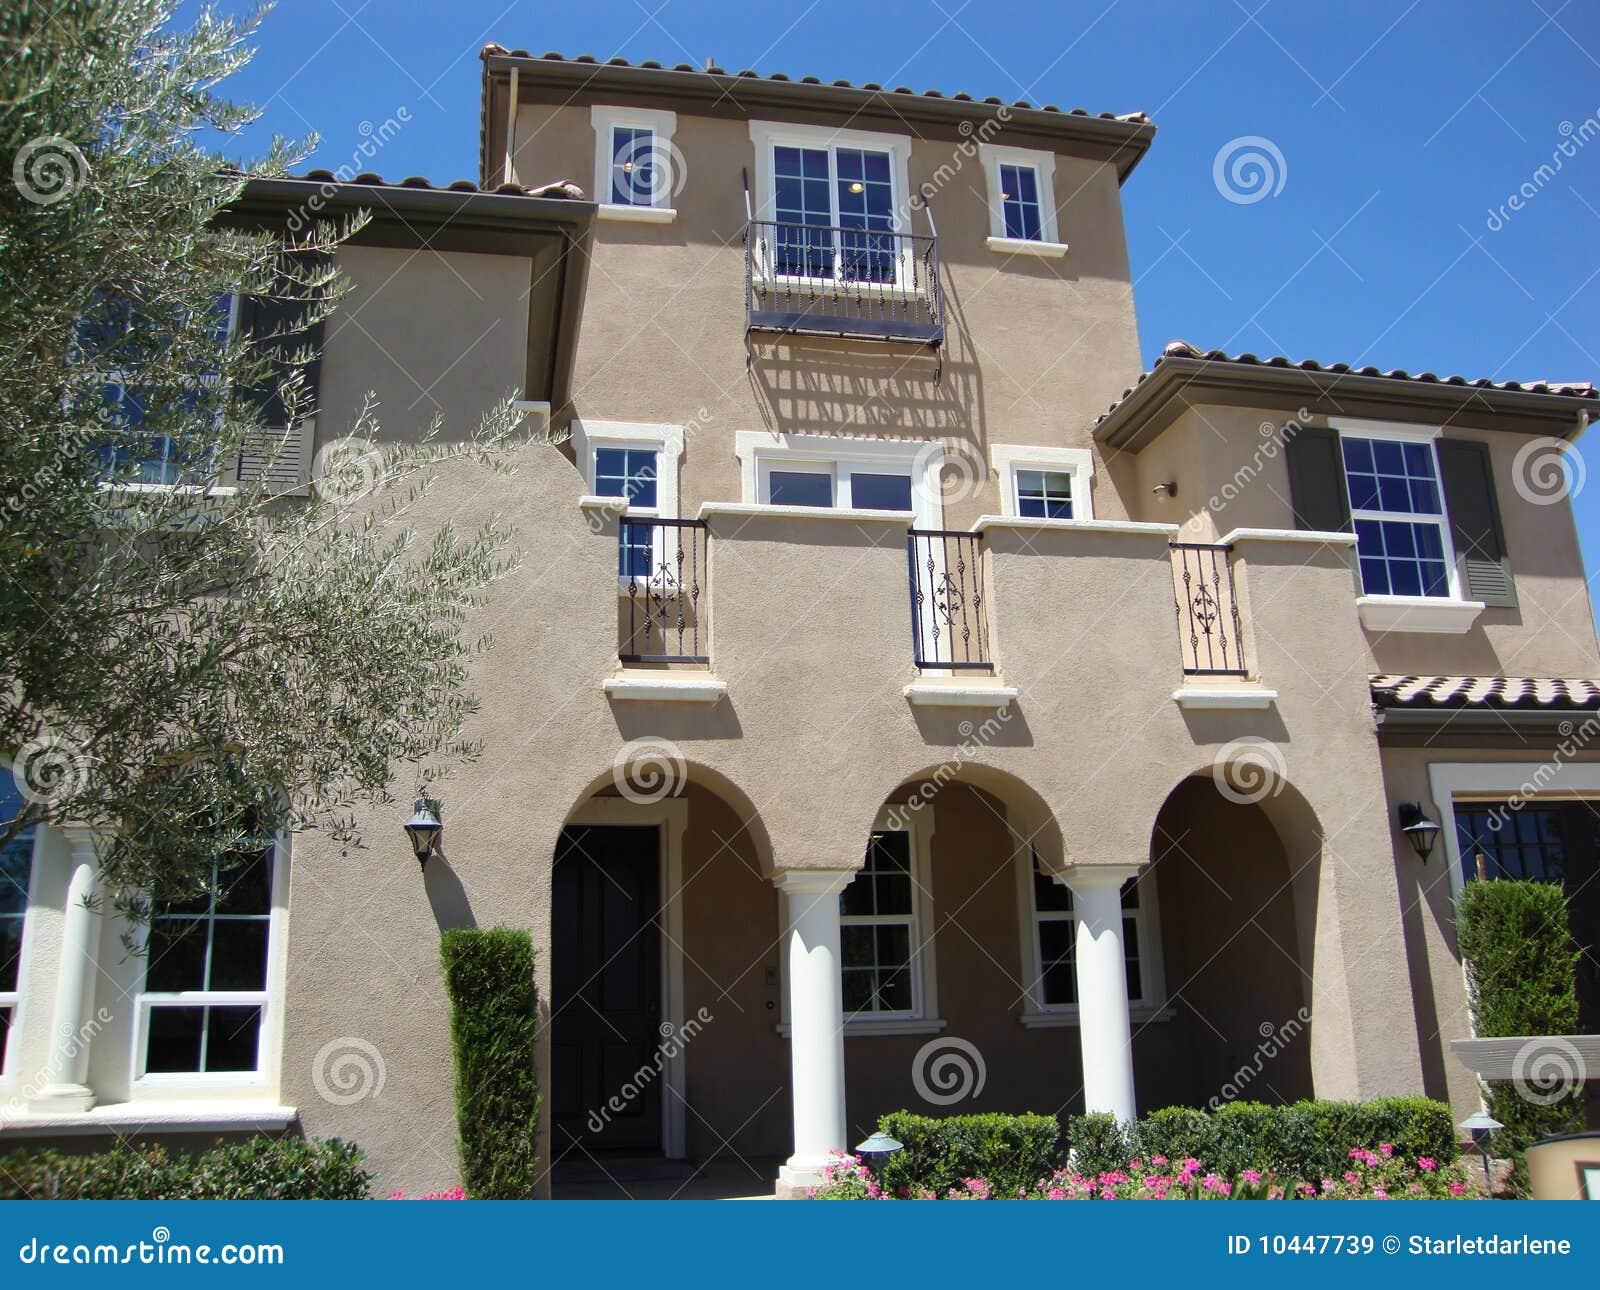 Beautiful luxury home royalty free stock images image for Free luxury home images